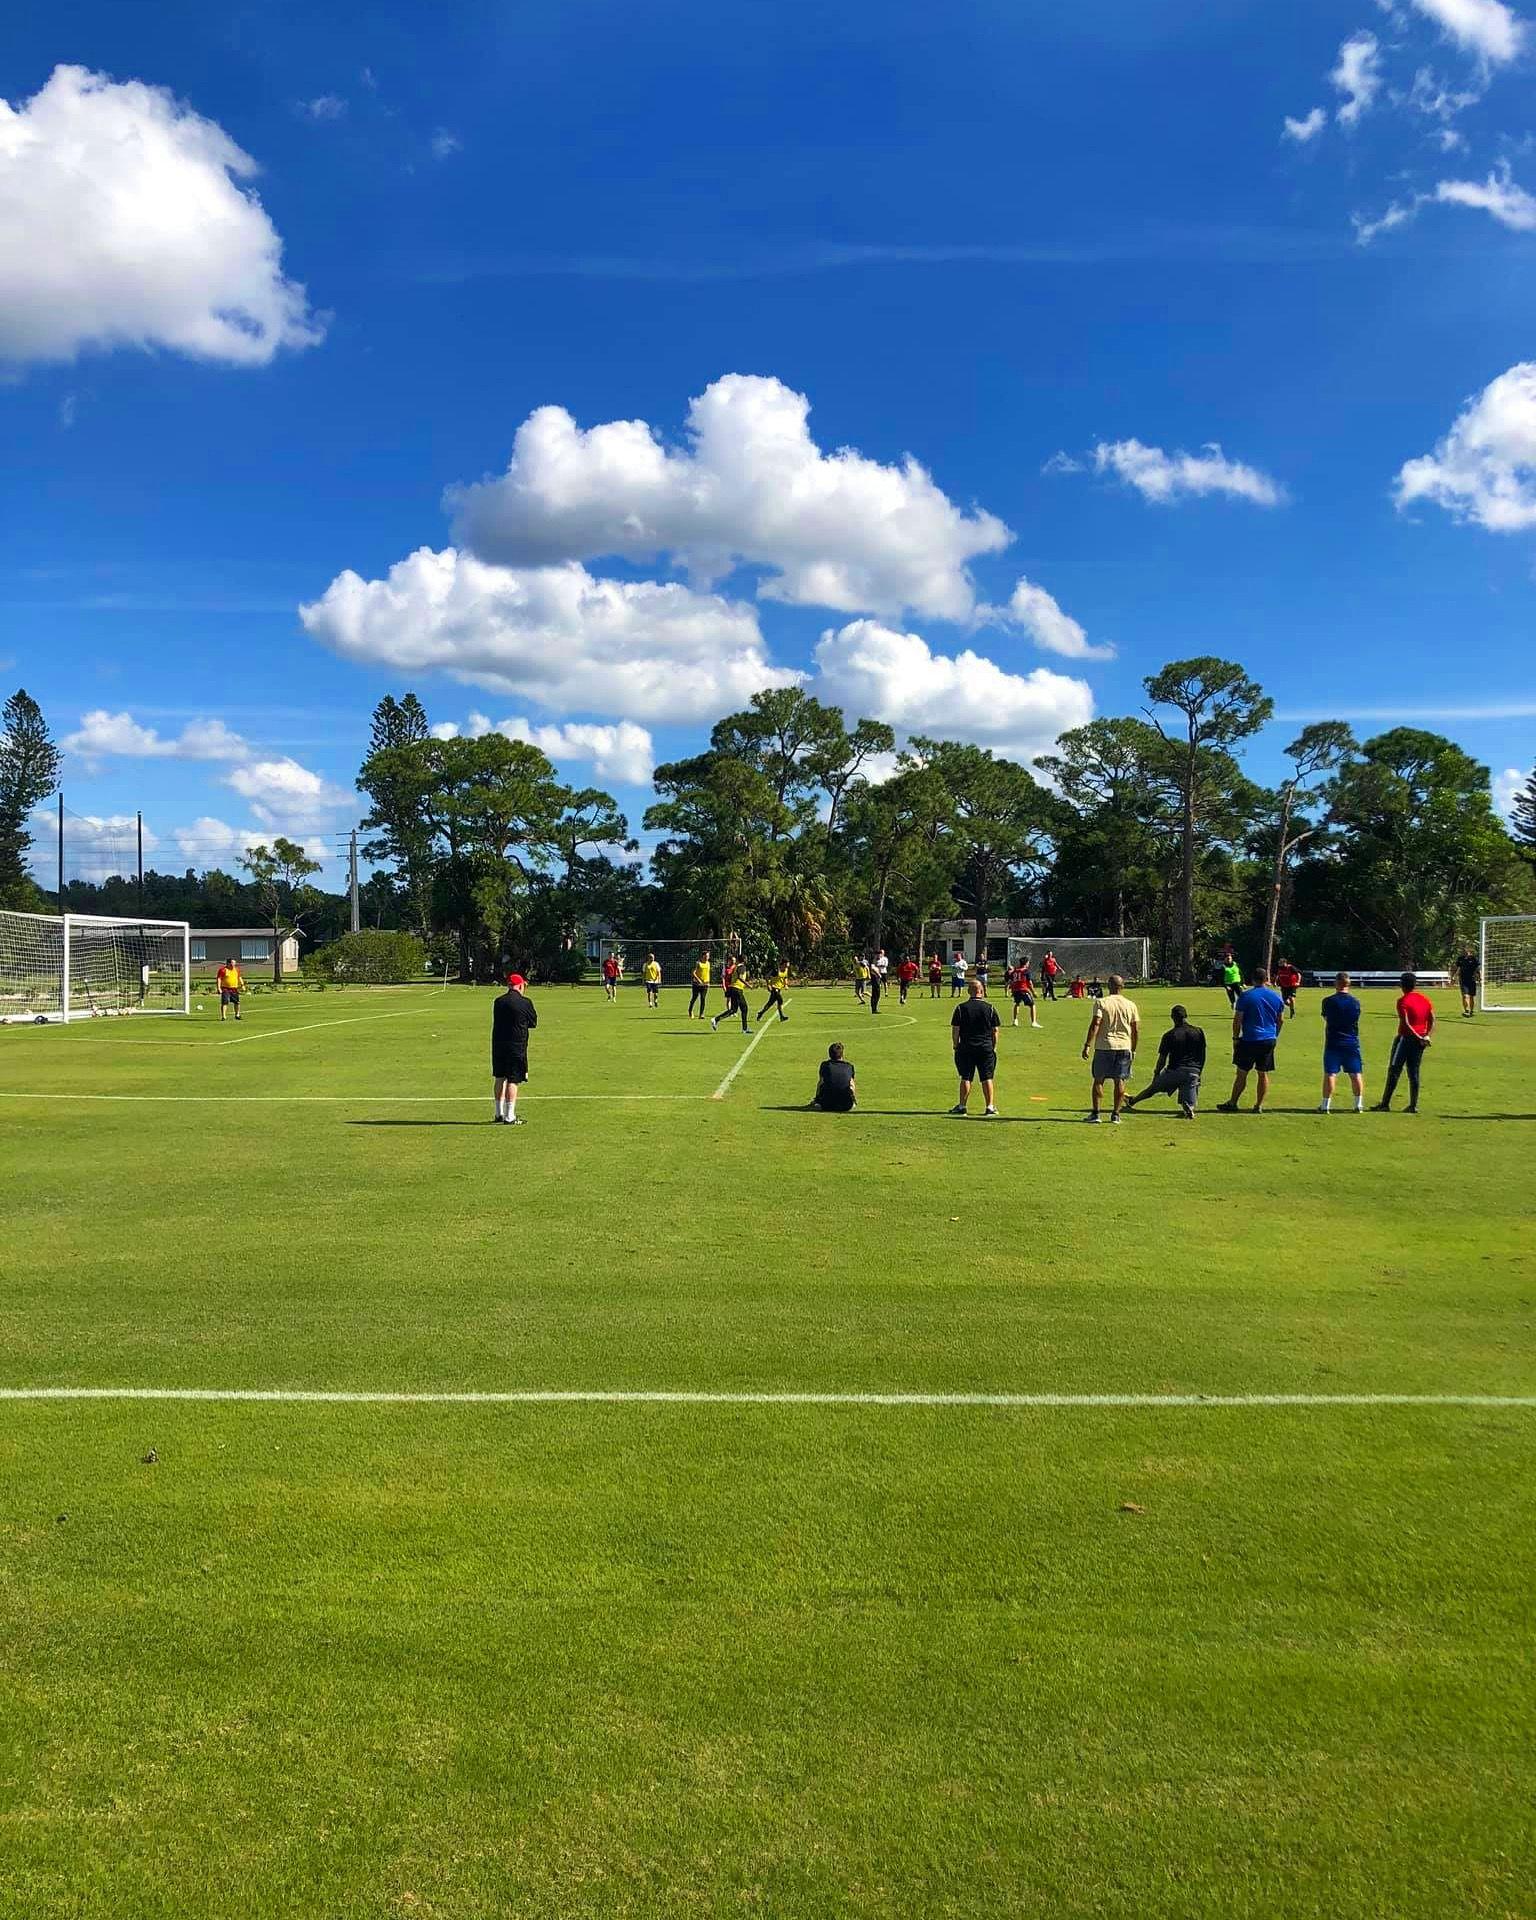 Summer Activities For Kids In 2020 Soccer Camp International Soccer Soccer